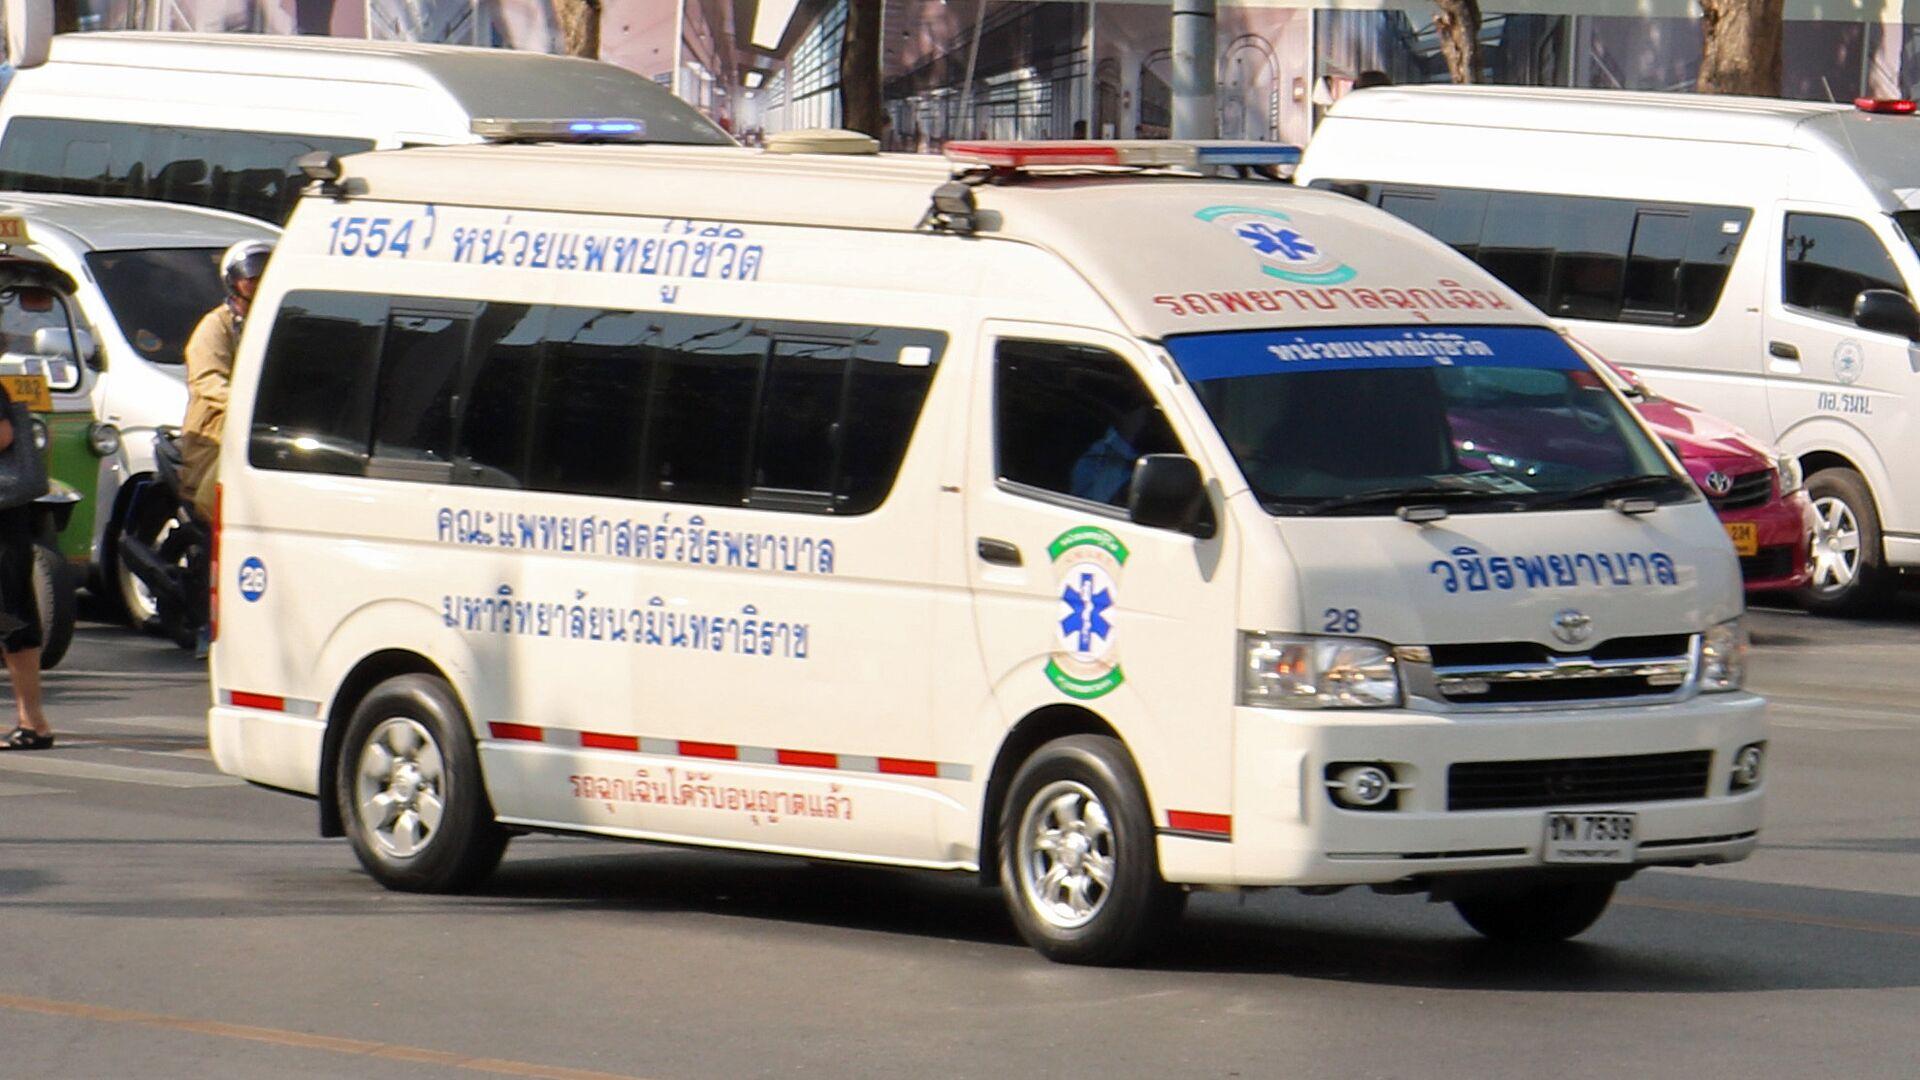 1498265534 0:37:1981:1151 1920x0 80 0 0 6e17df899dc78a451fde83e6b9673746 - В Таиланде при столкновении автобуса и грузовика погибли семь человек